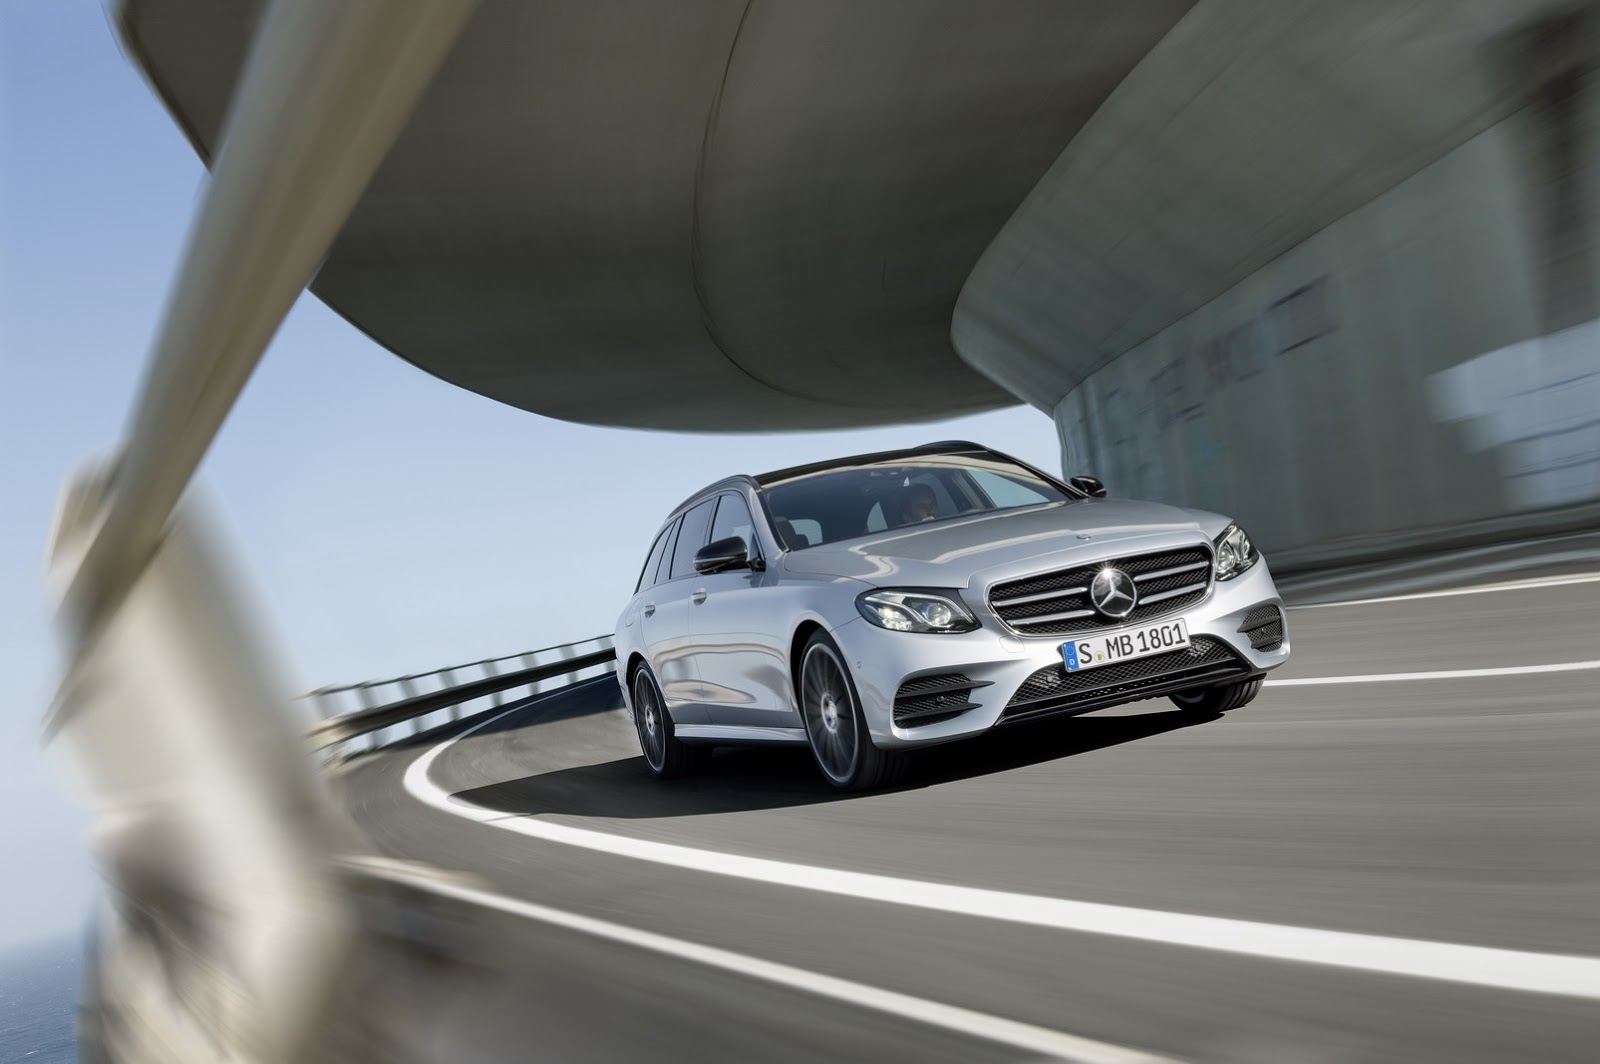 2017-Mercedes-Estate-E-Class-25.jpg